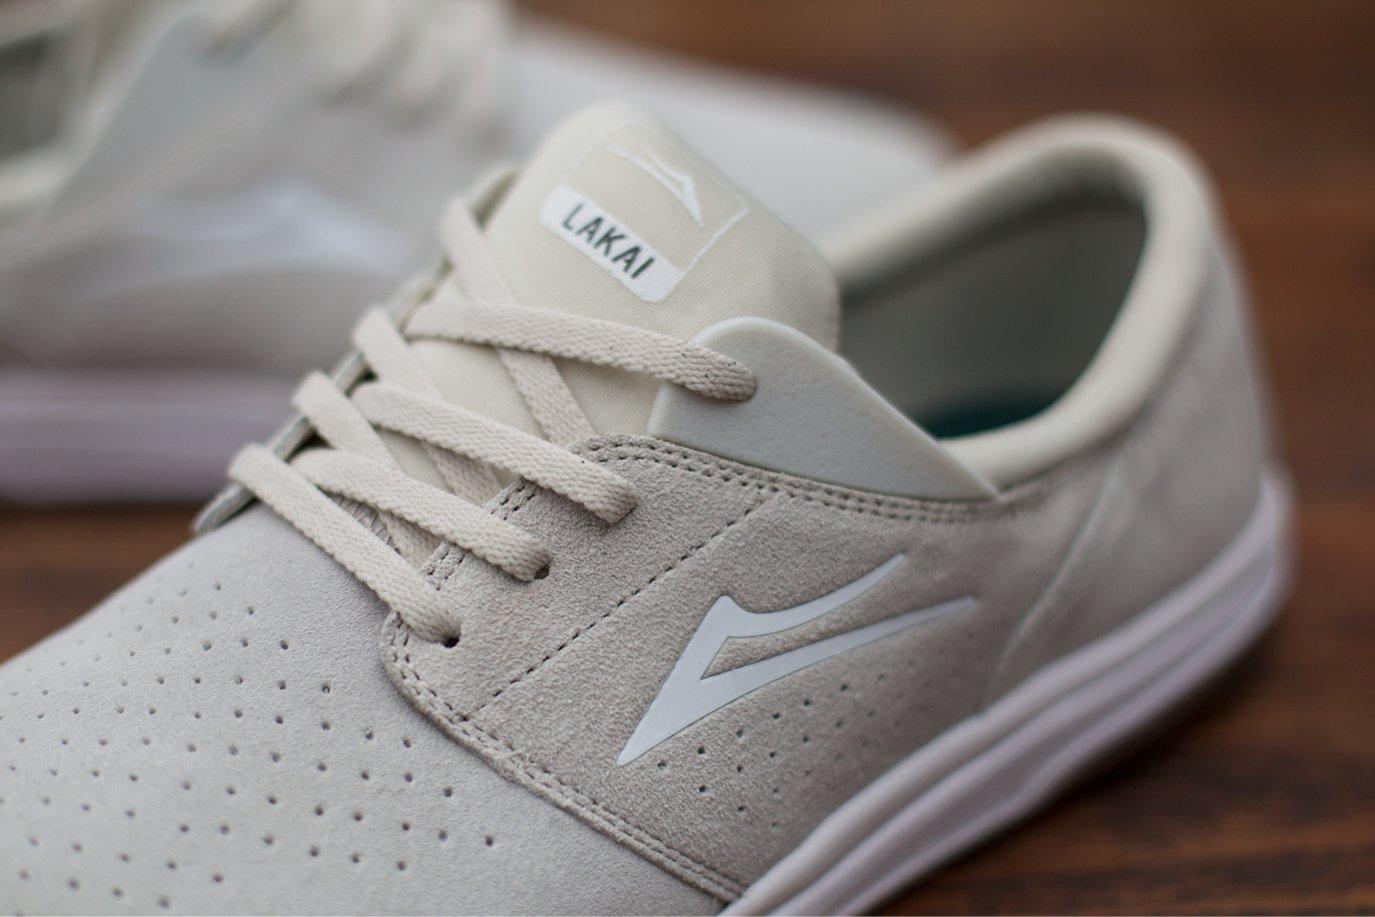 Lakai Limited Footwear Introducing The Lakai Fremont Milled